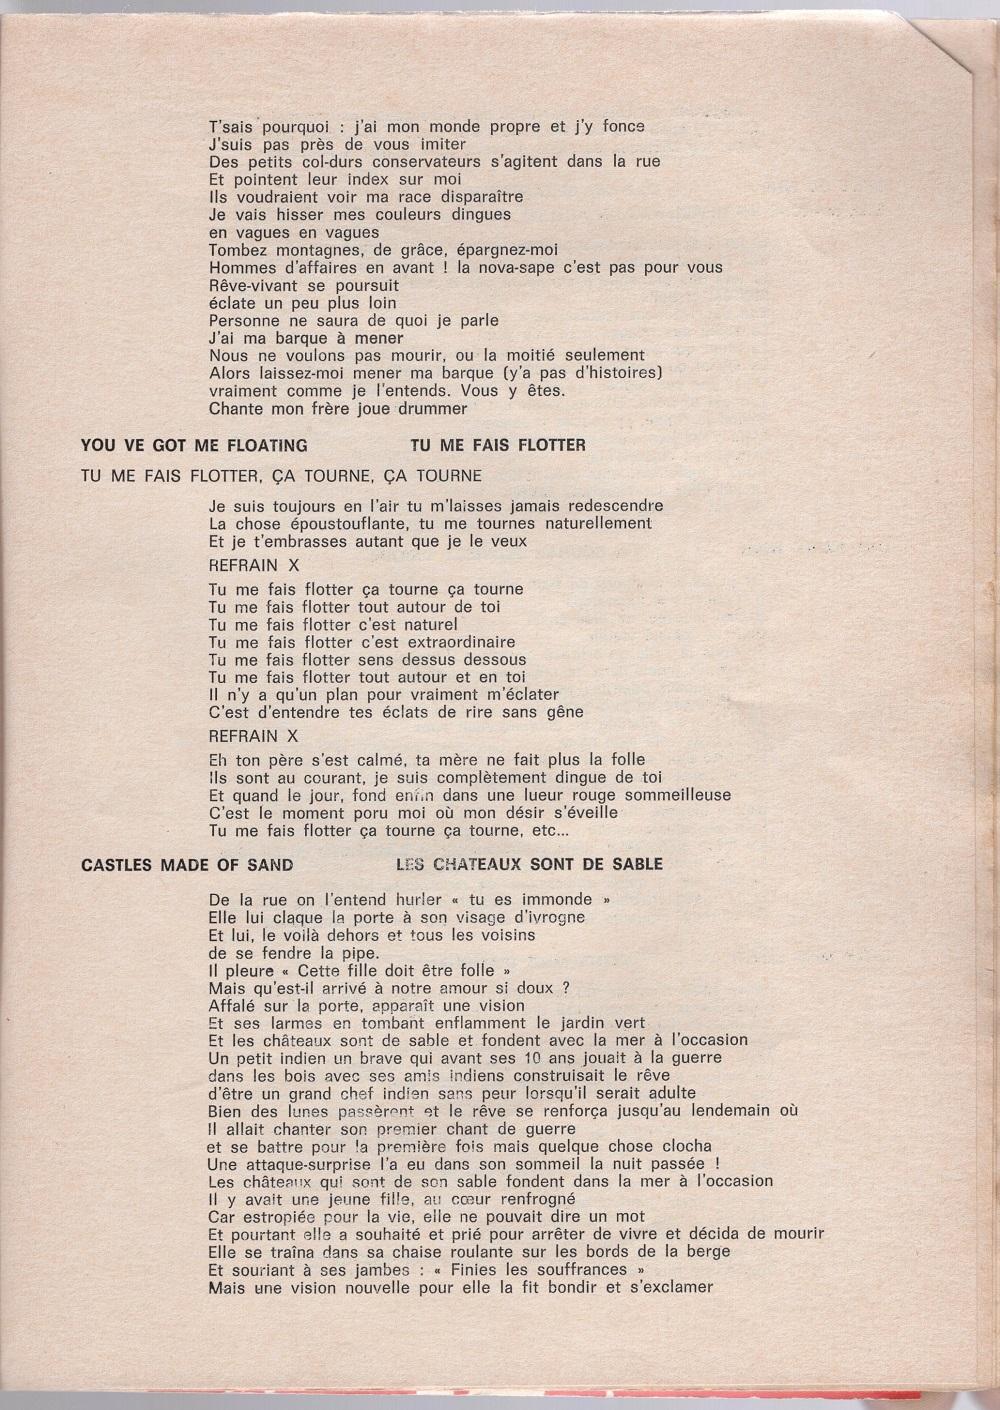 Curio Francais... Jimi Hendrix Songbook - Page 2 7010